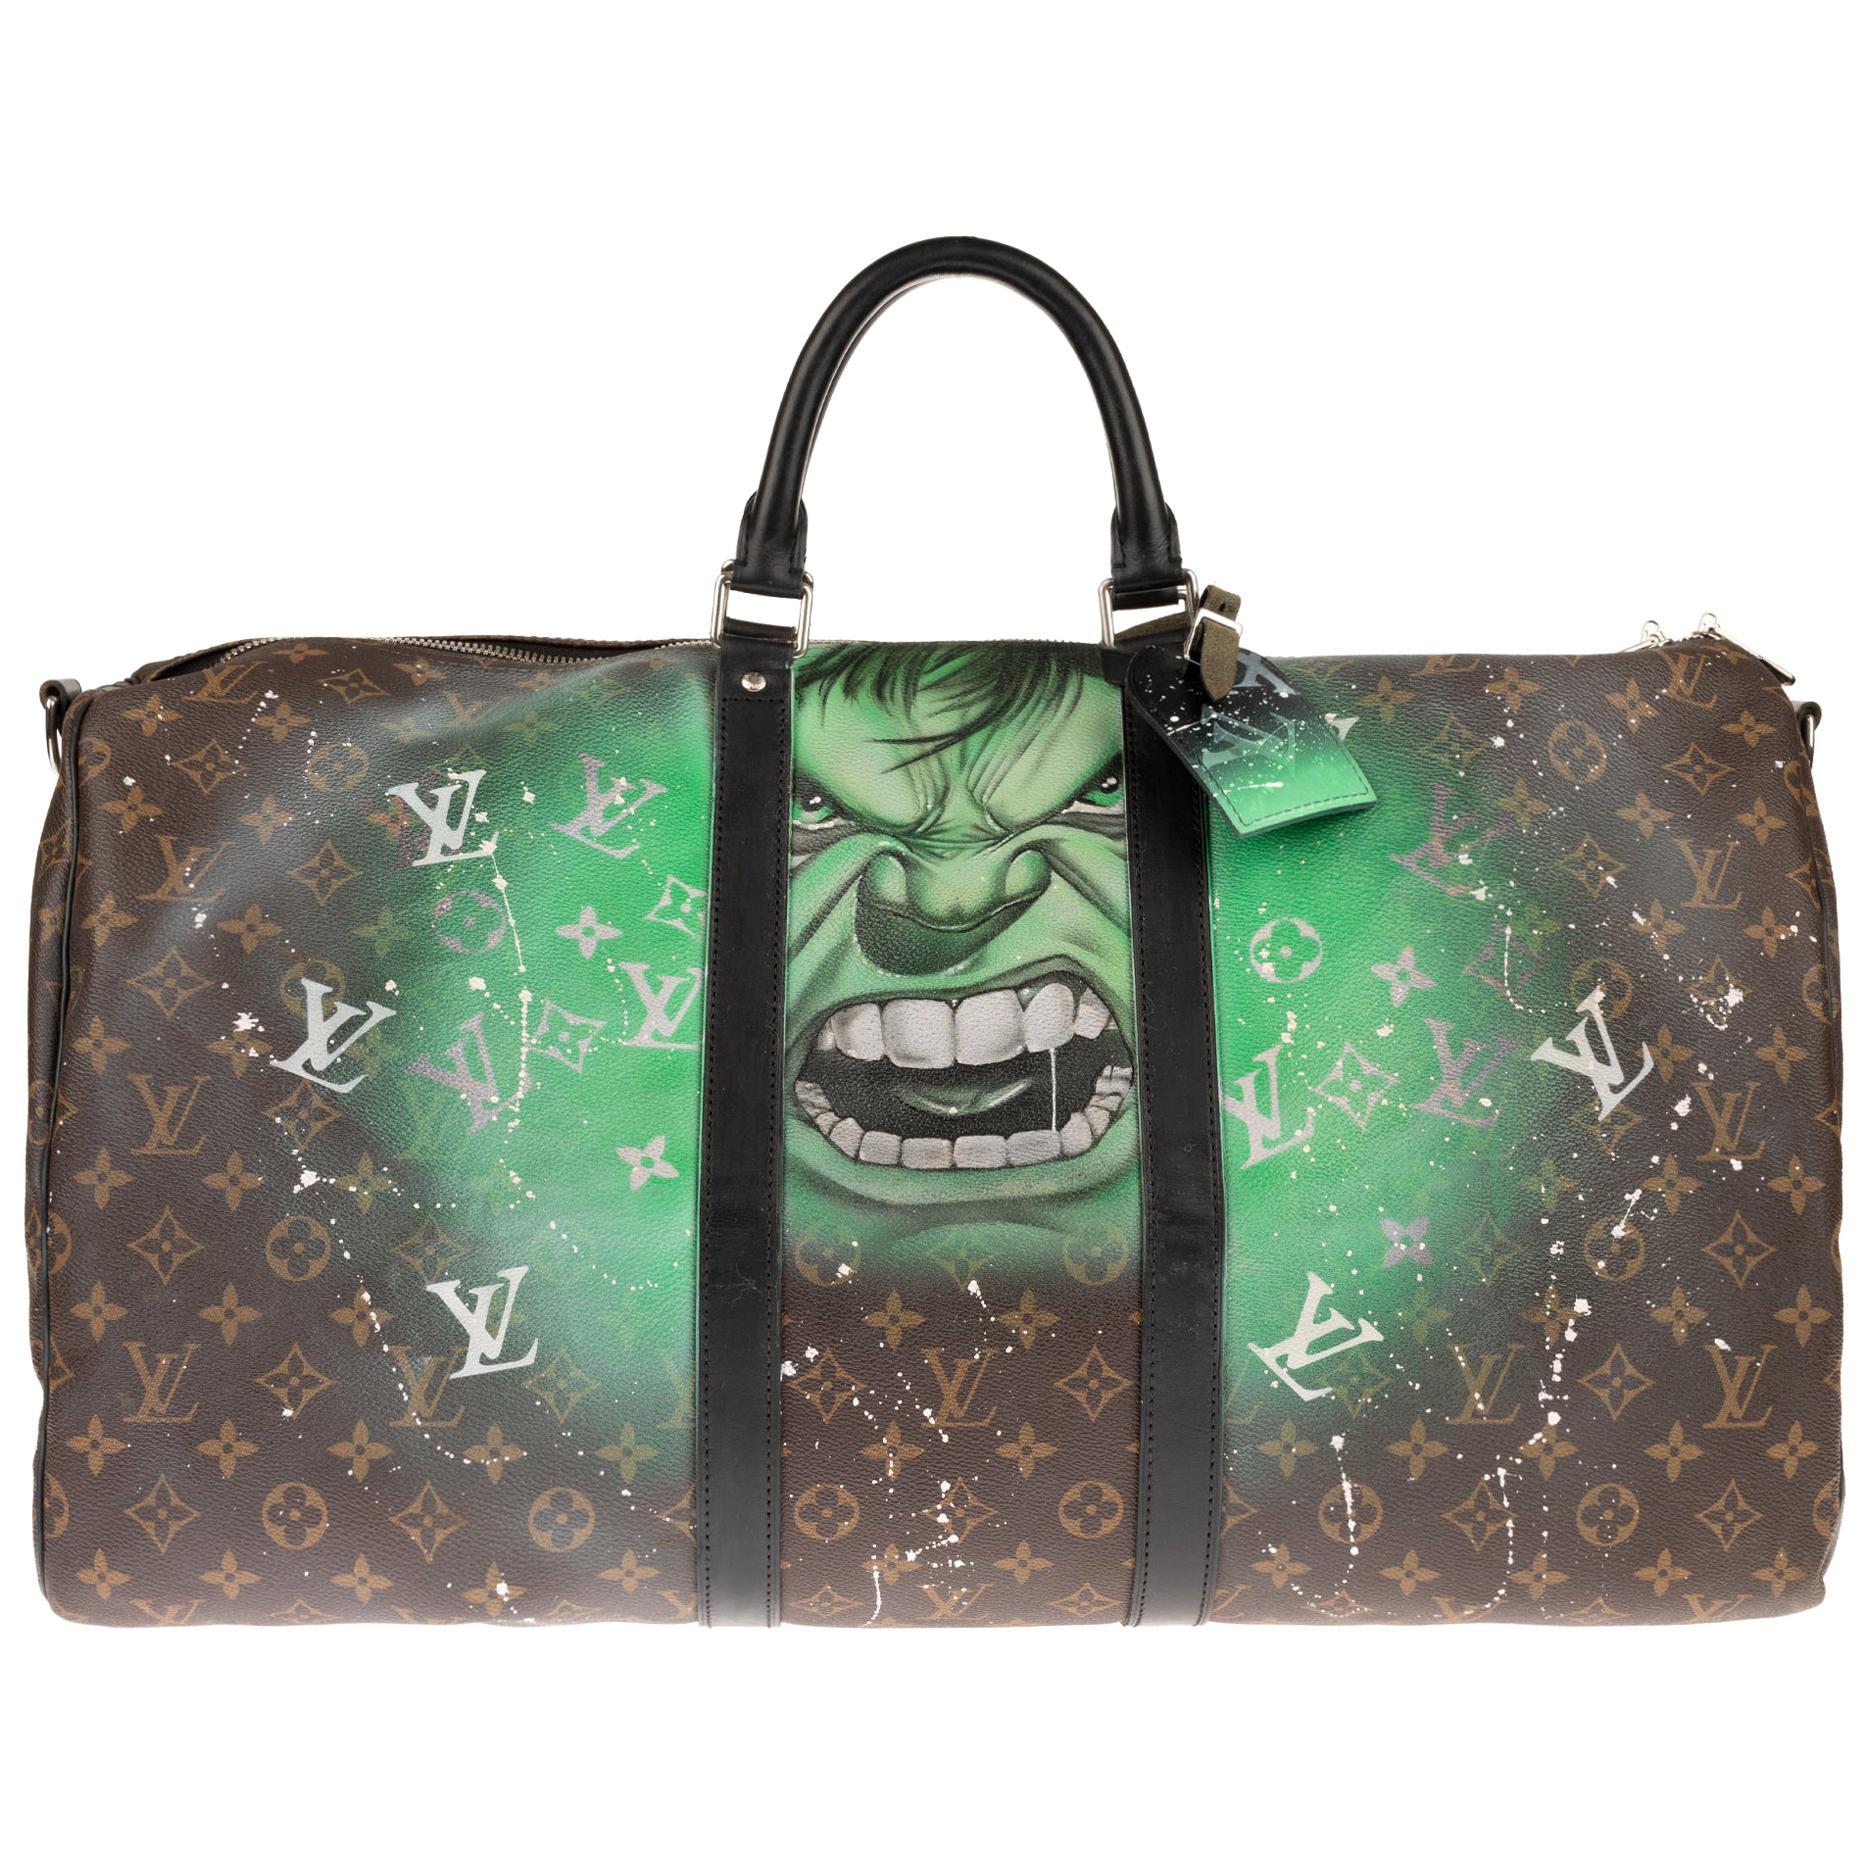 Travel/Sport Louis Vuitton Keepall 55 bag in Monogram Canvas customized !